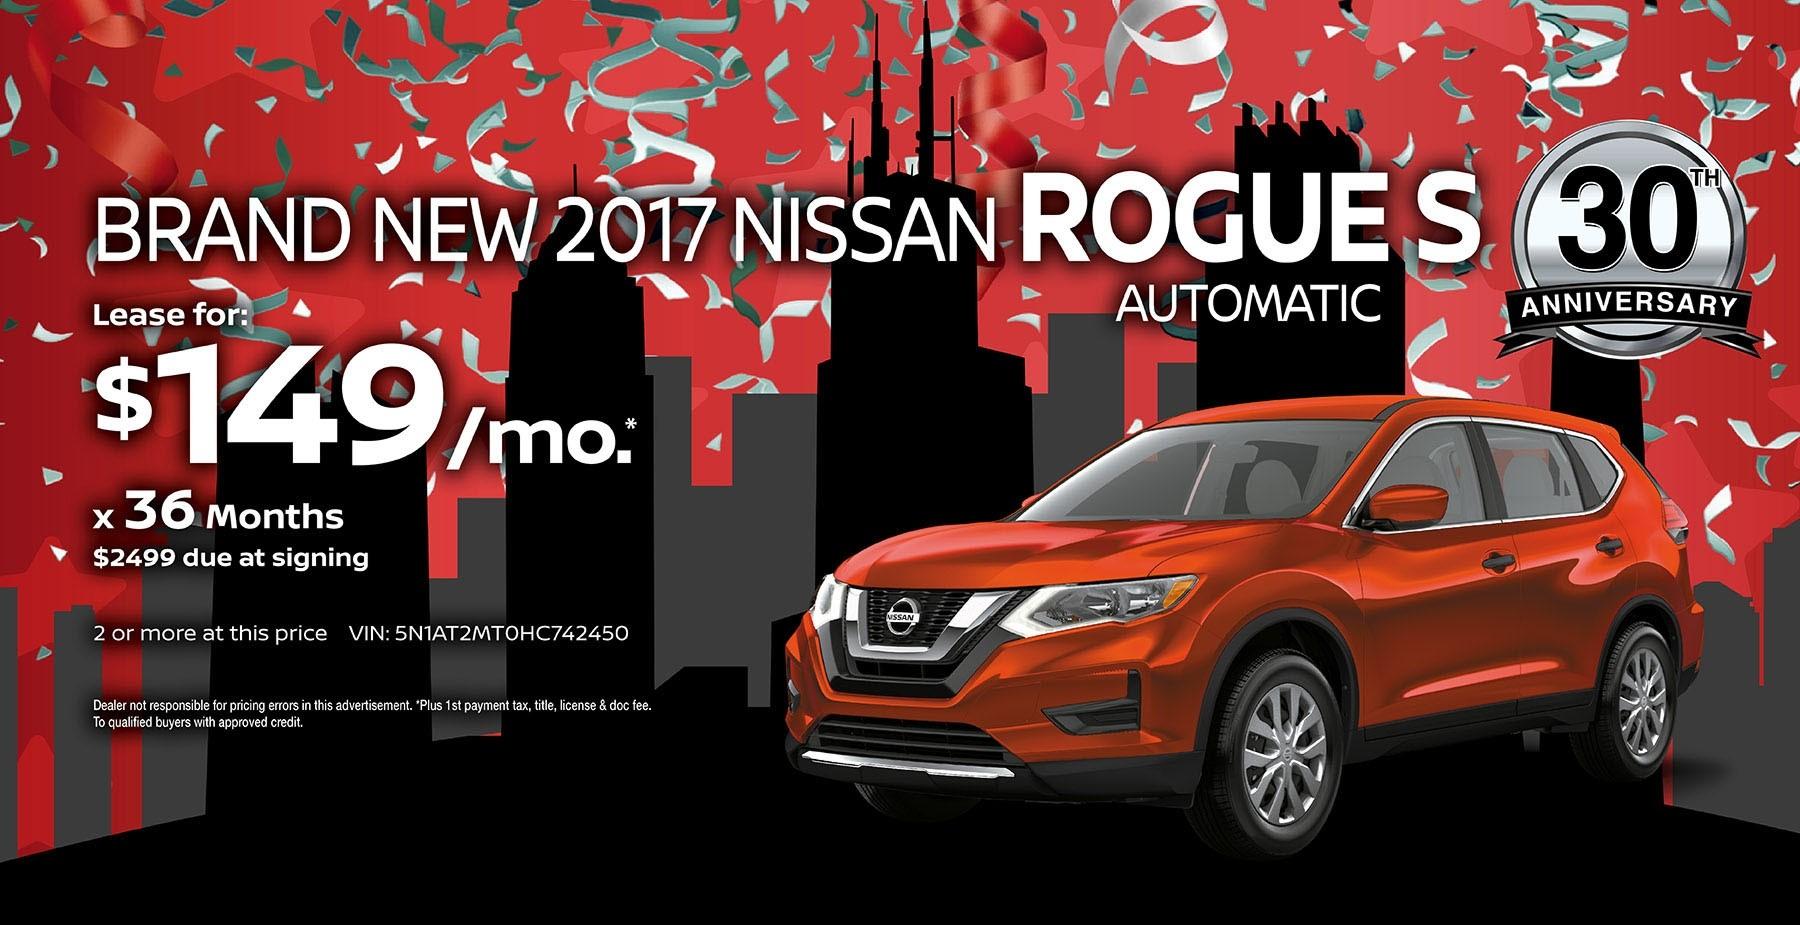 2017 Nissan Rogue July Sale at Star Nissan